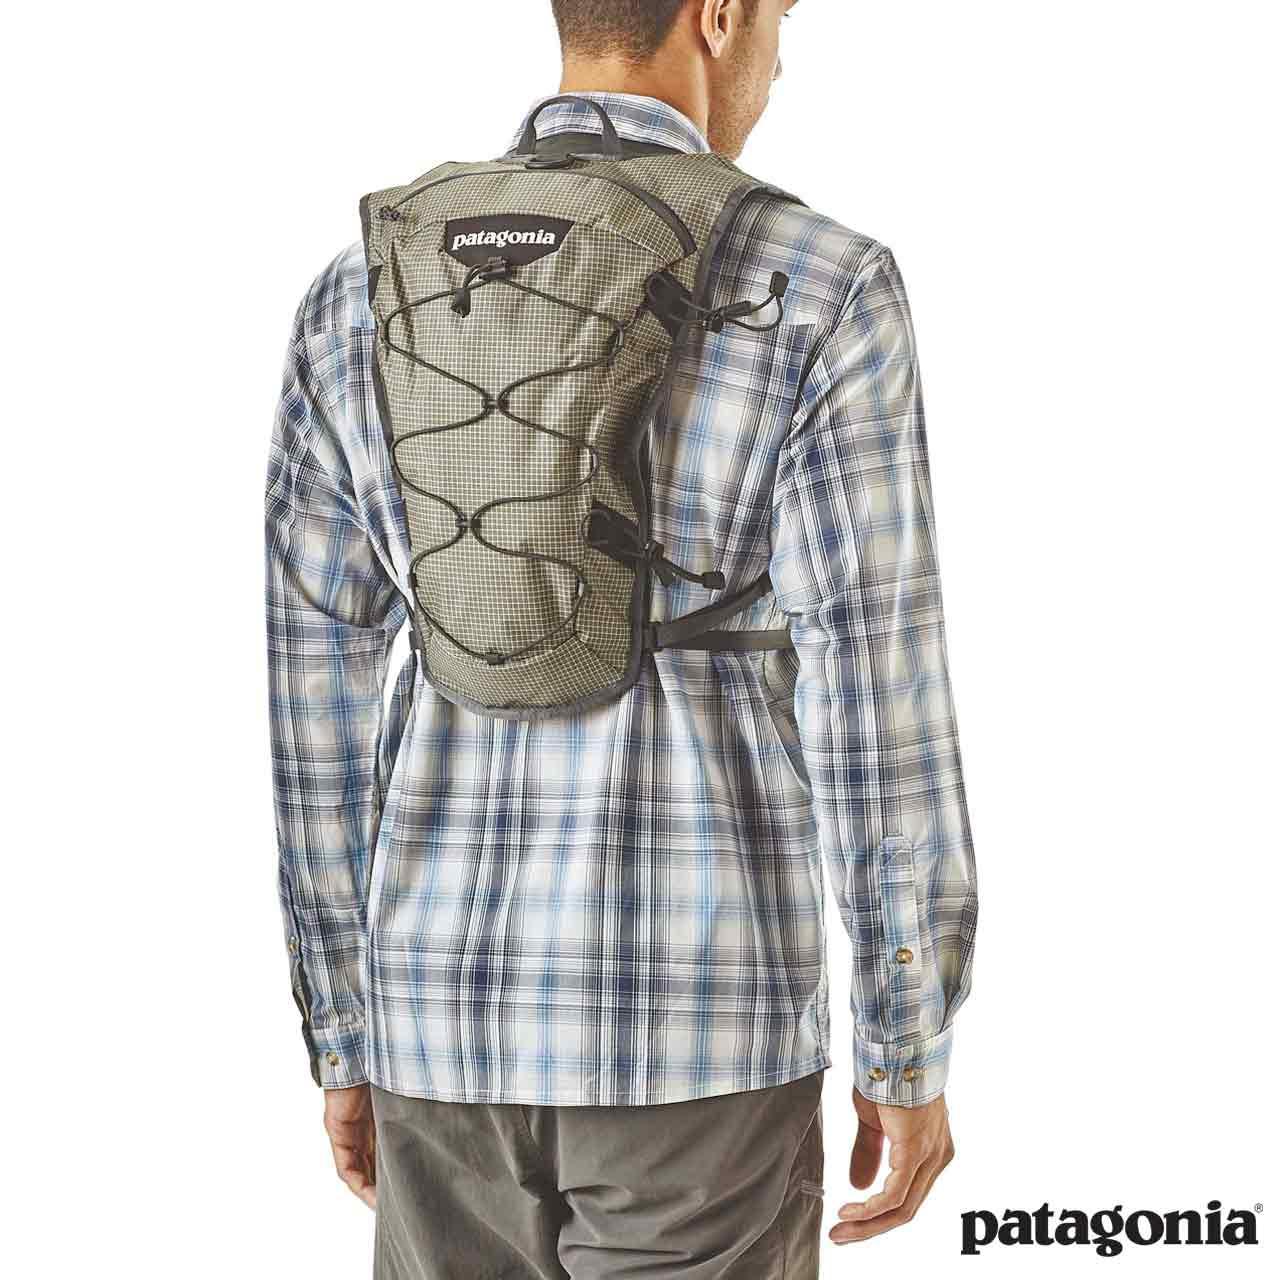 M Light Bog Patagonia Fly Fishing Hybrid Pack Vest S